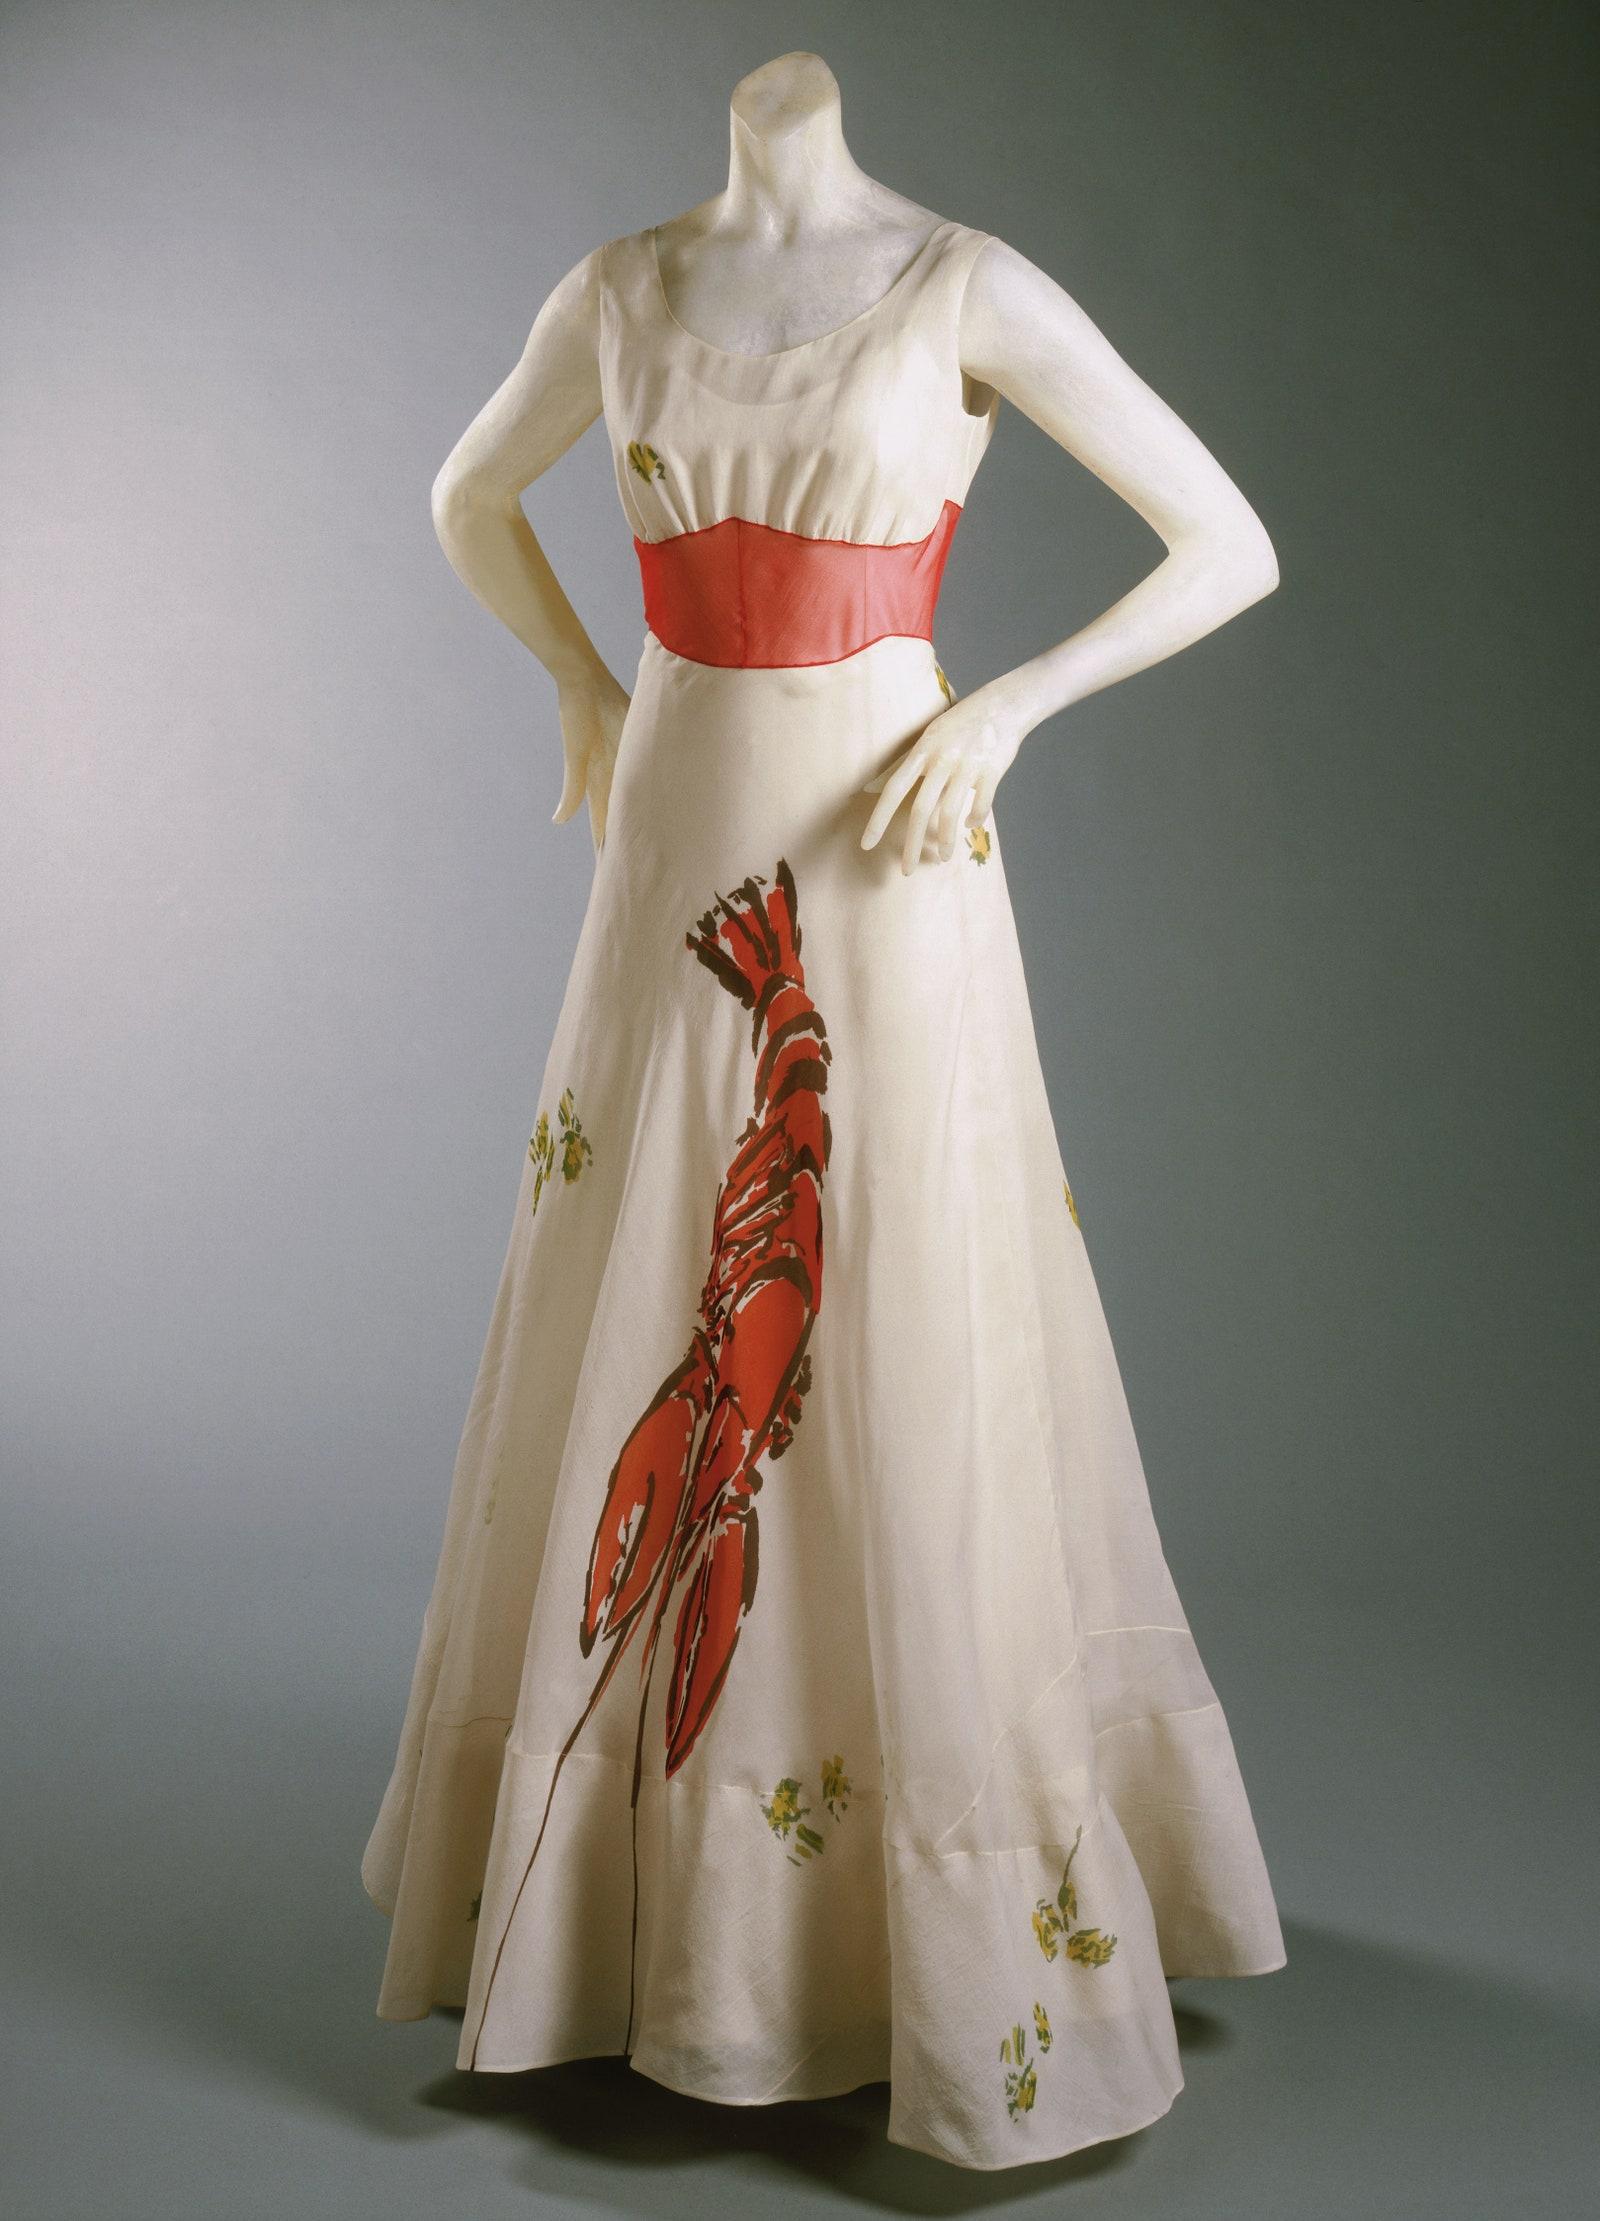 Elsa schiaparelli e salvador dalí, abito aragosta (1937)